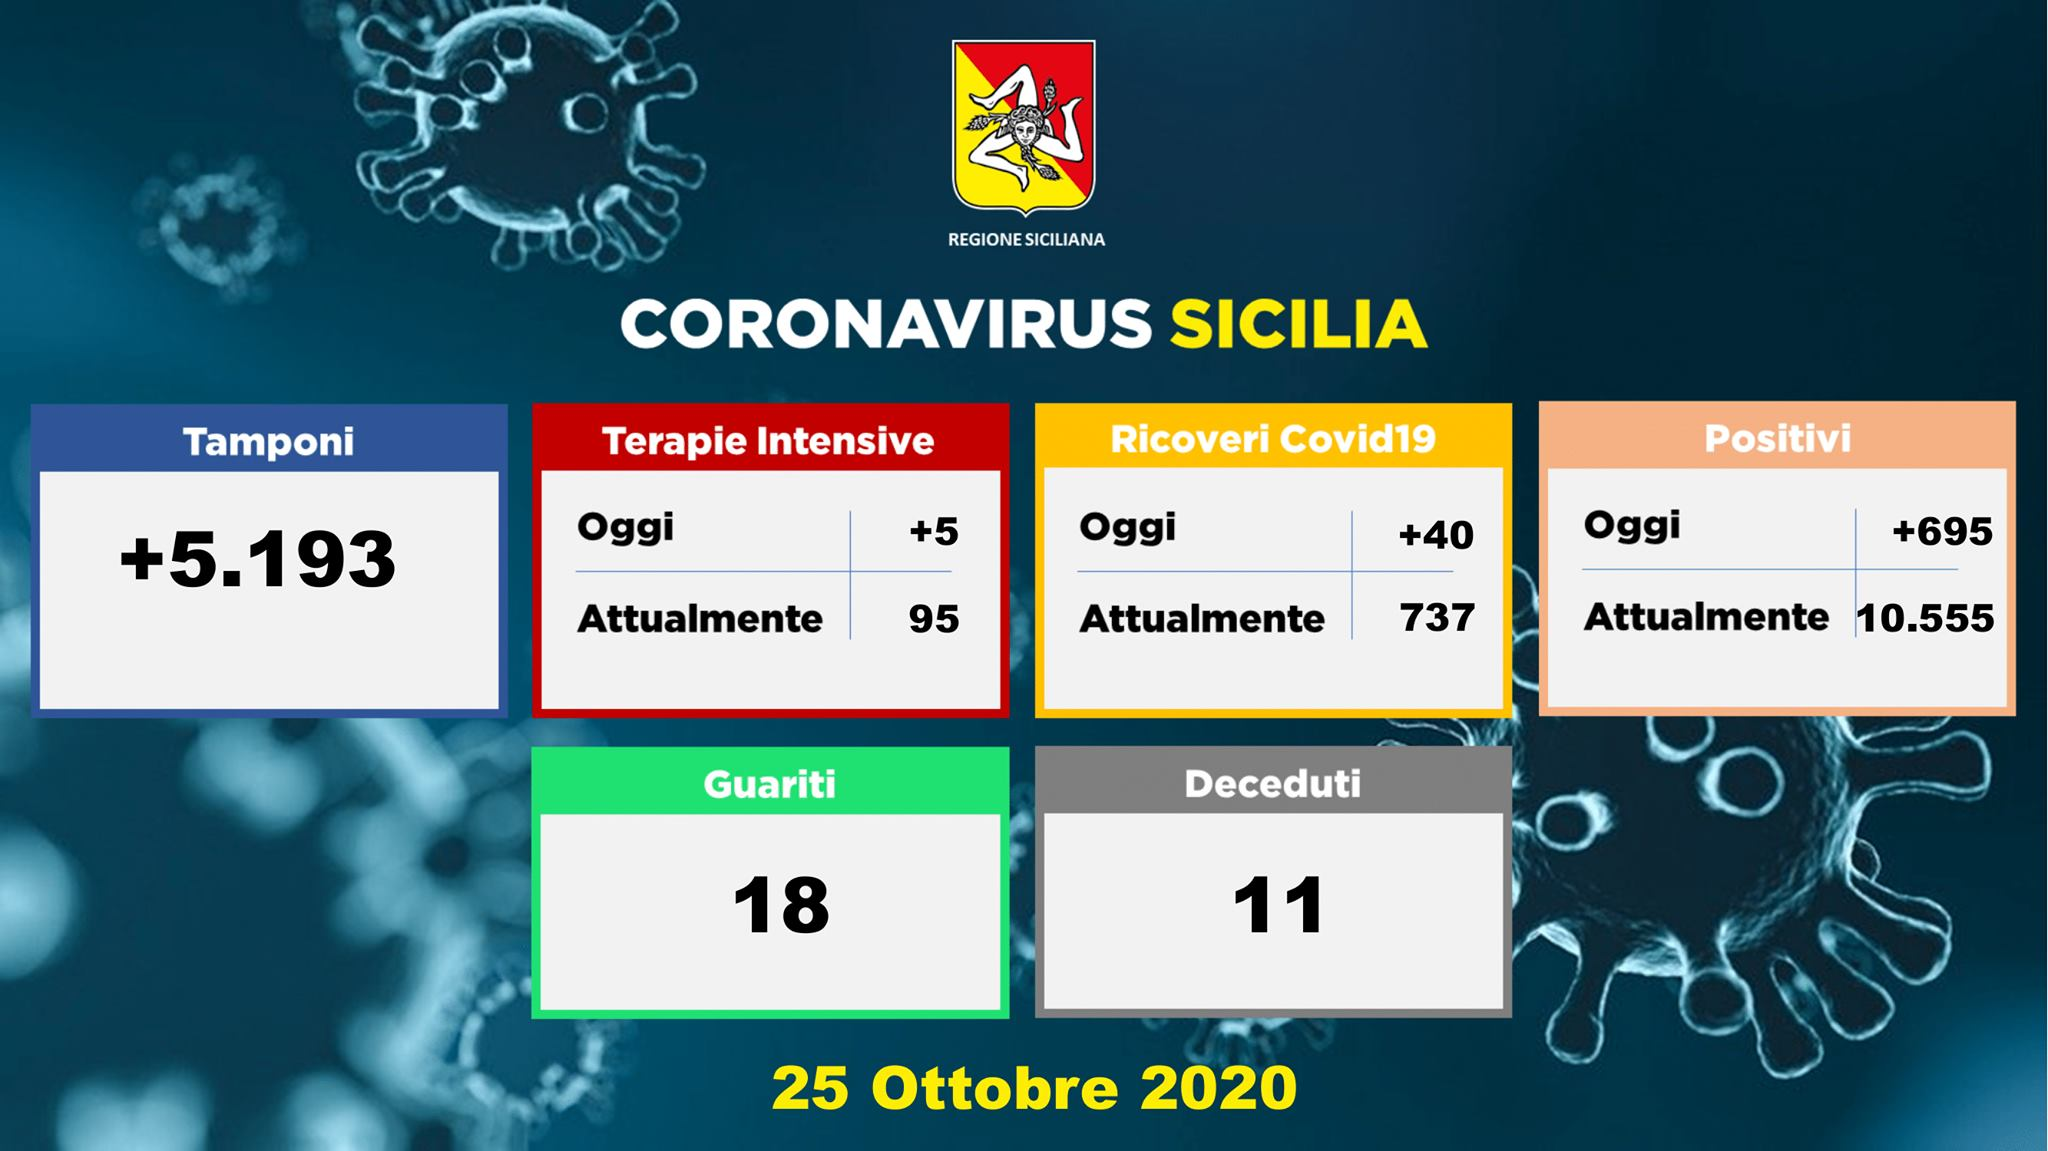 Sicilia: 13% di positivi sui tamponi